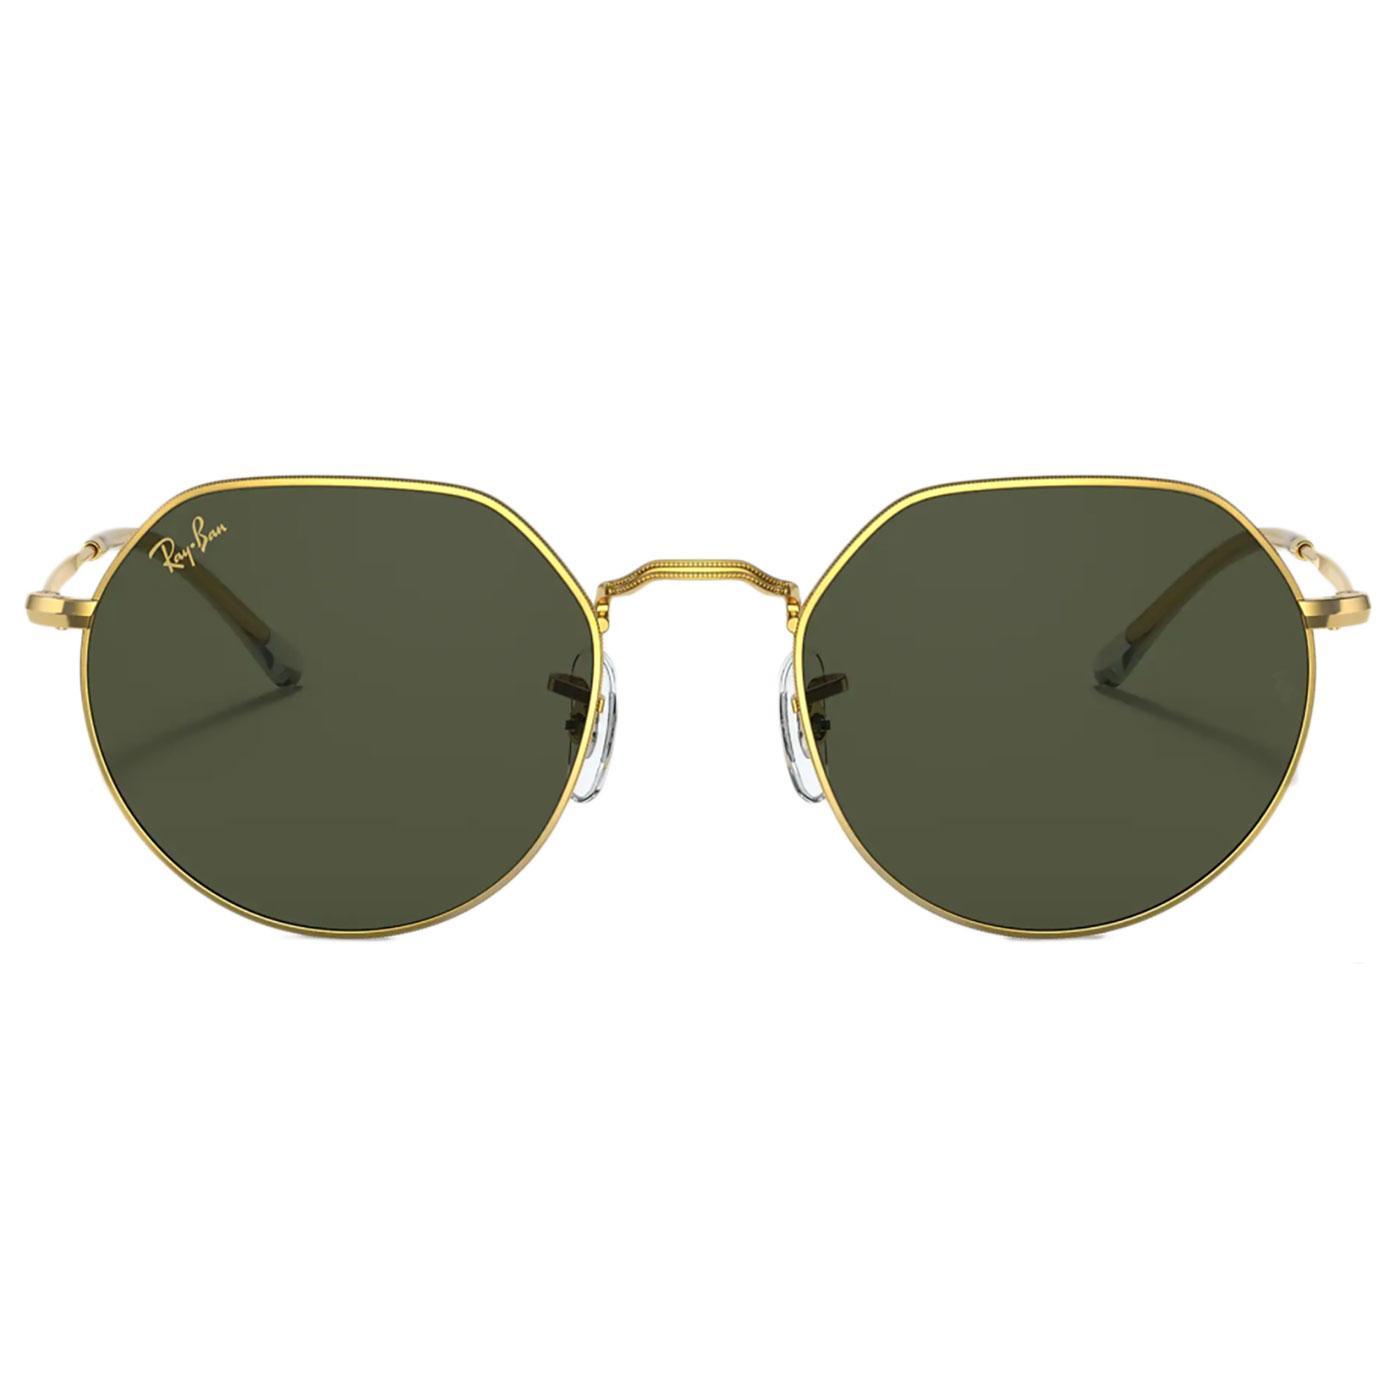 Jack RAY-BAN Retro 60s/70s Hexagonal Sunglasses GG